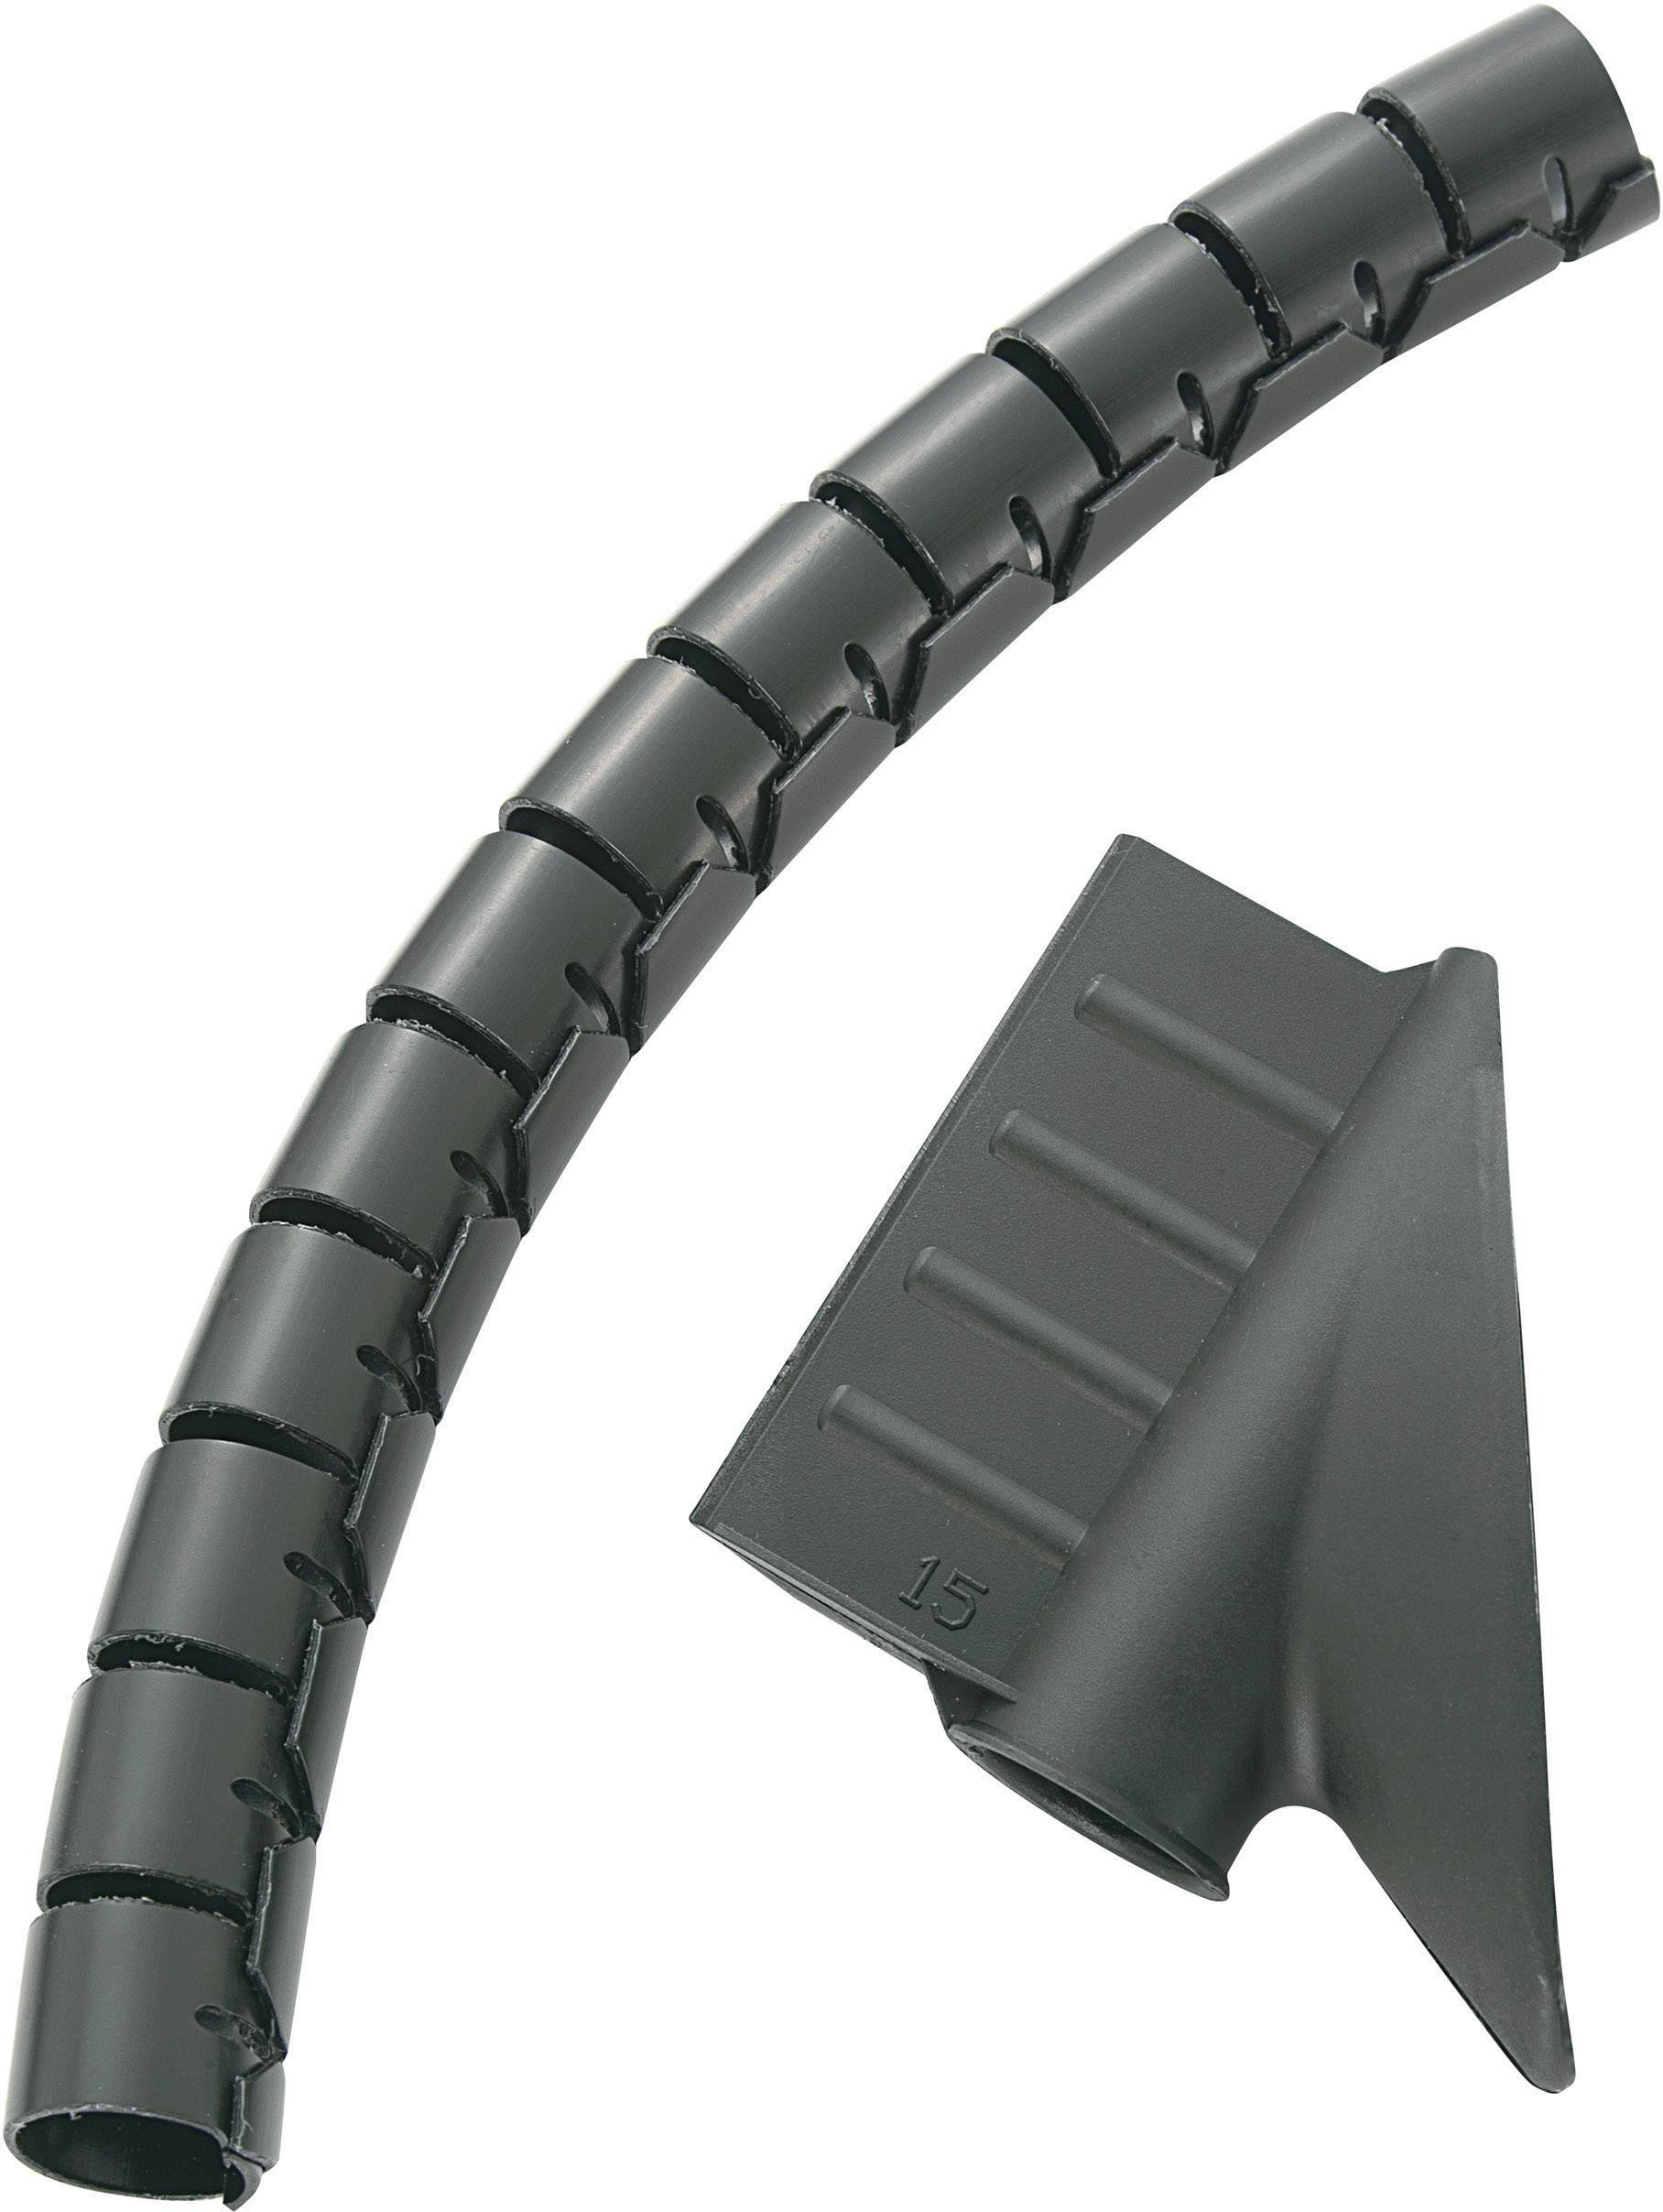 Spirálová trubice na kabely KSS MX-KLT25WE (28530c1029), 25 mm, bílá